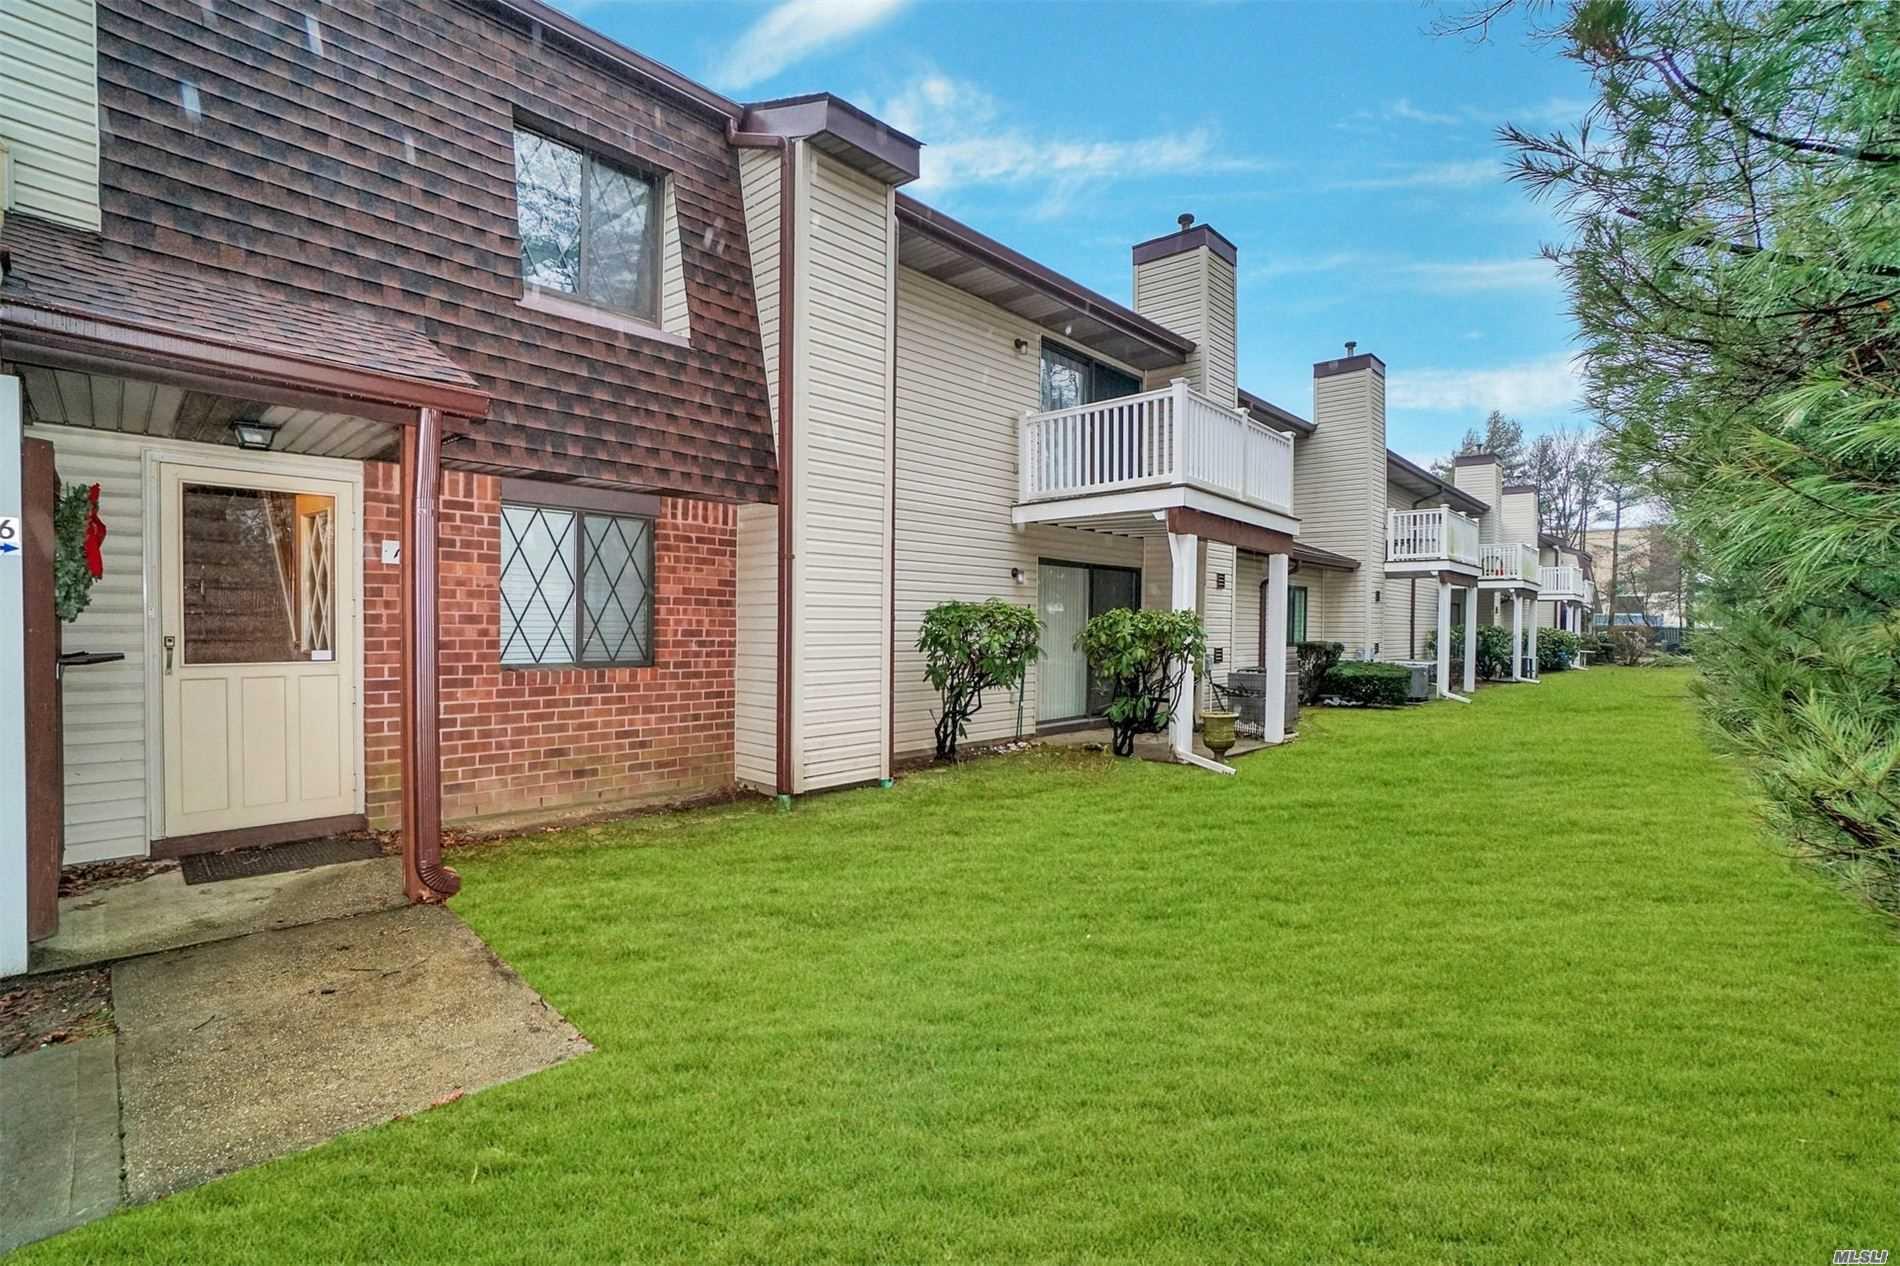 Property for sale at 166 Cambridge Drive # 166, Copiague NY 11726, Copiague,  New York 11726